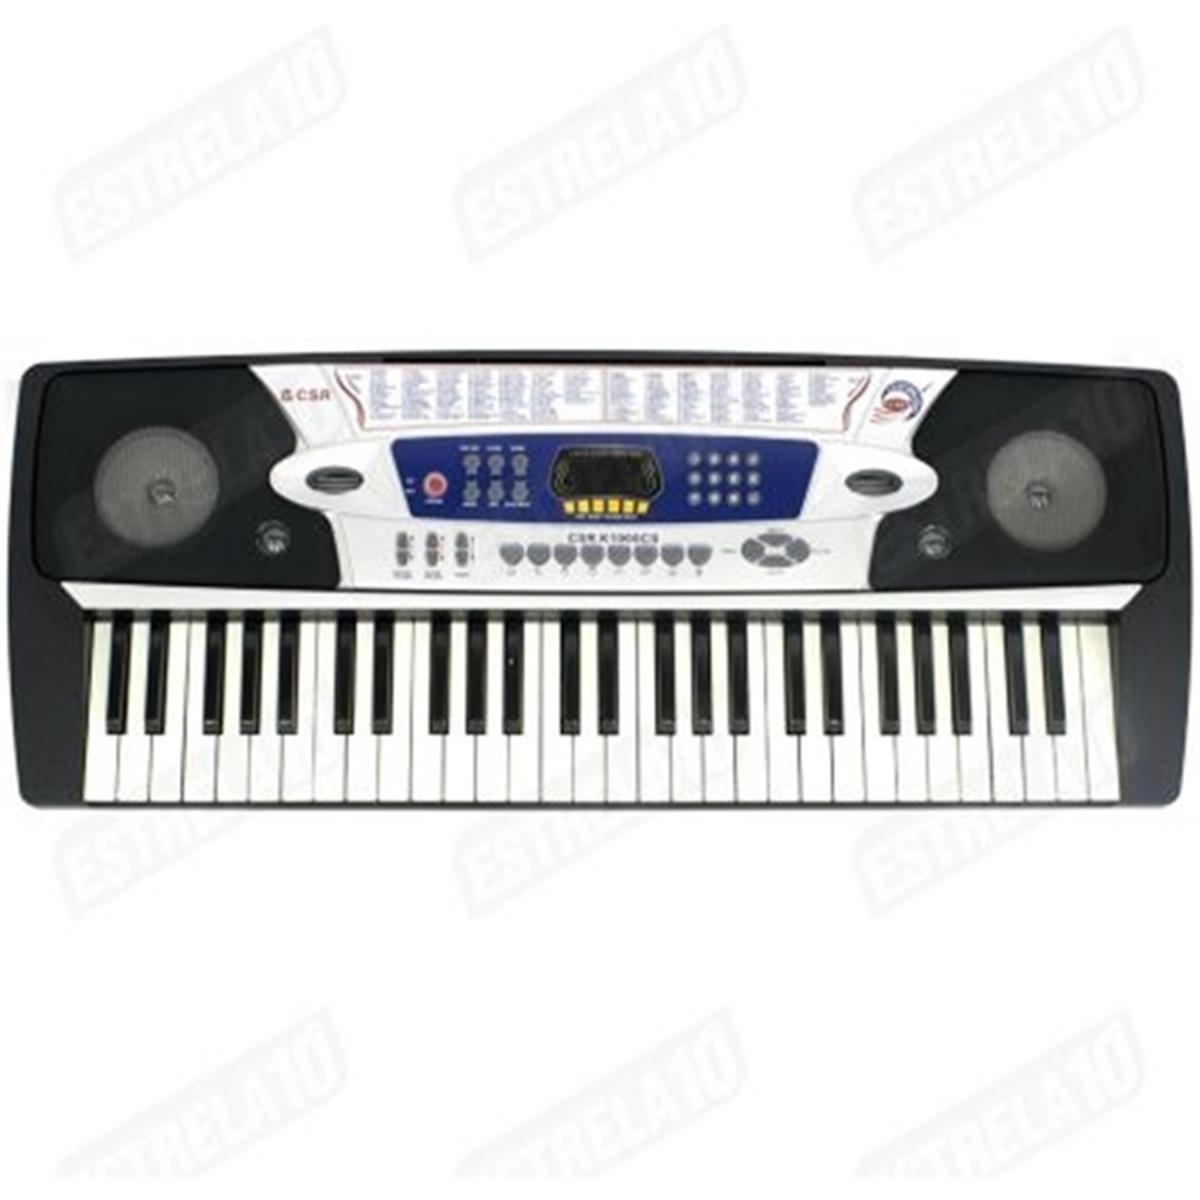 Teclado Musical Com 54 Teclas E Fonte Bivolt K1900cs Csr